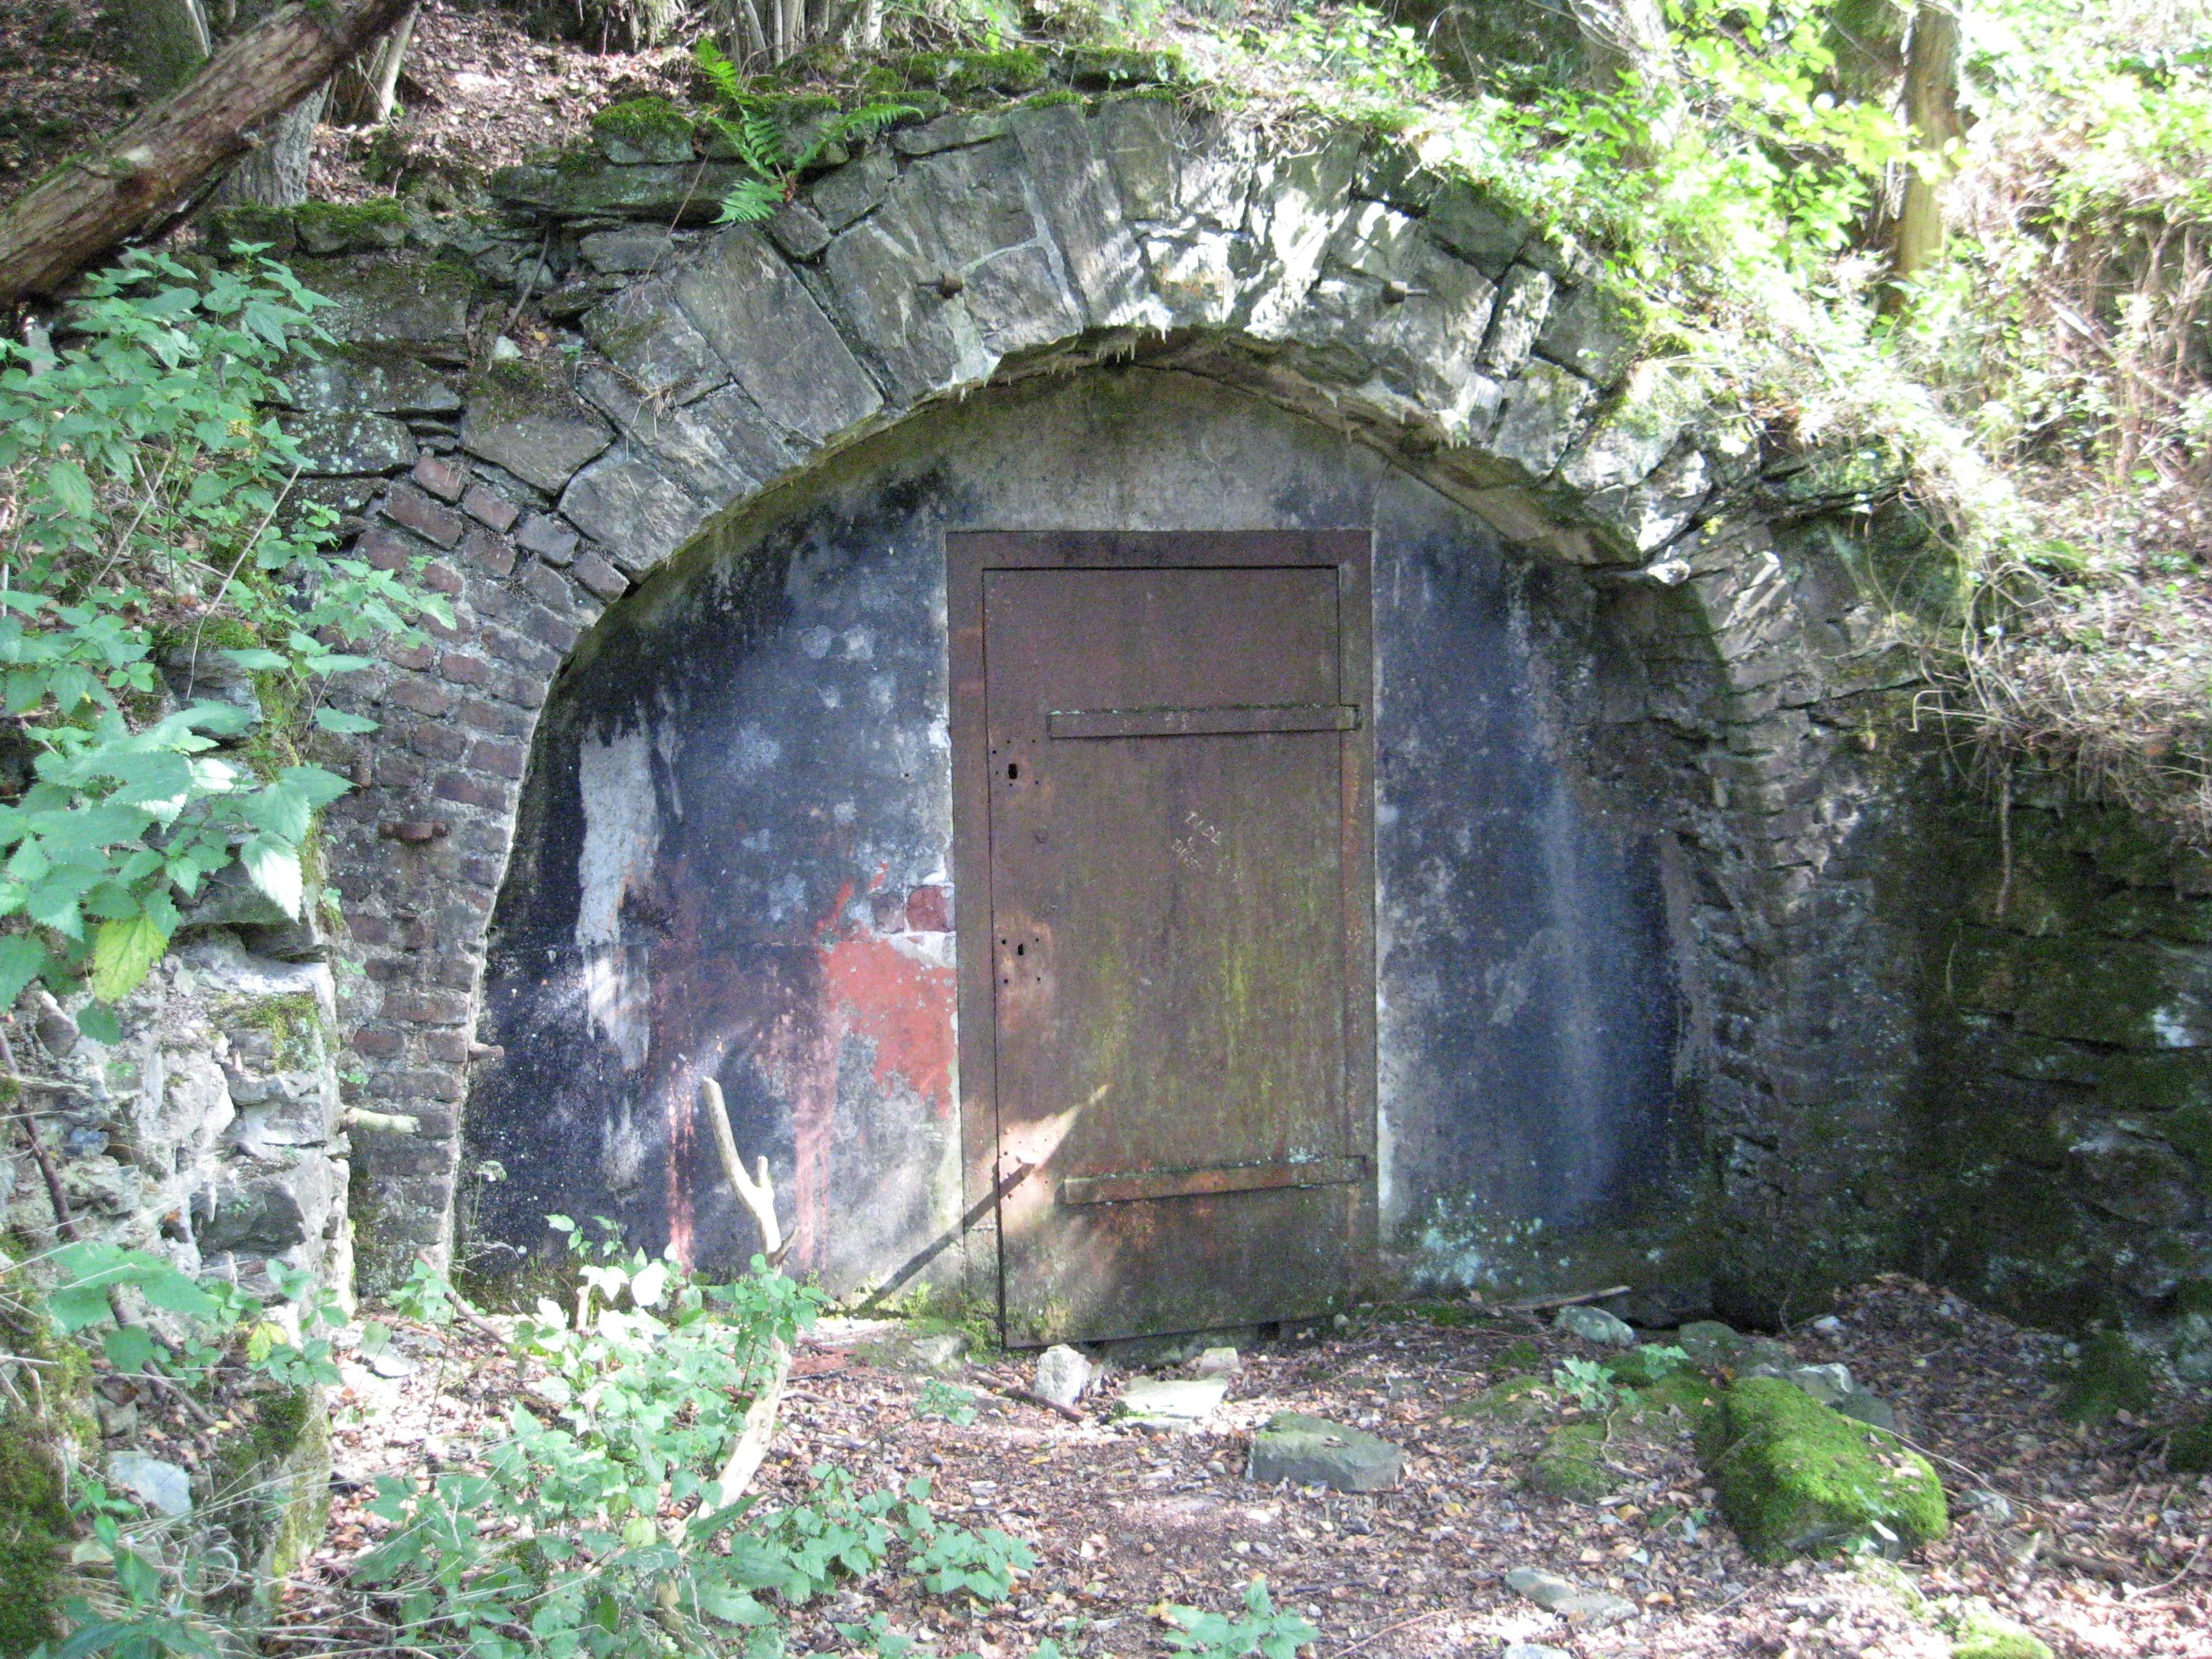 altes Bergwerk Grube_Ameise_-_Stolleneingang